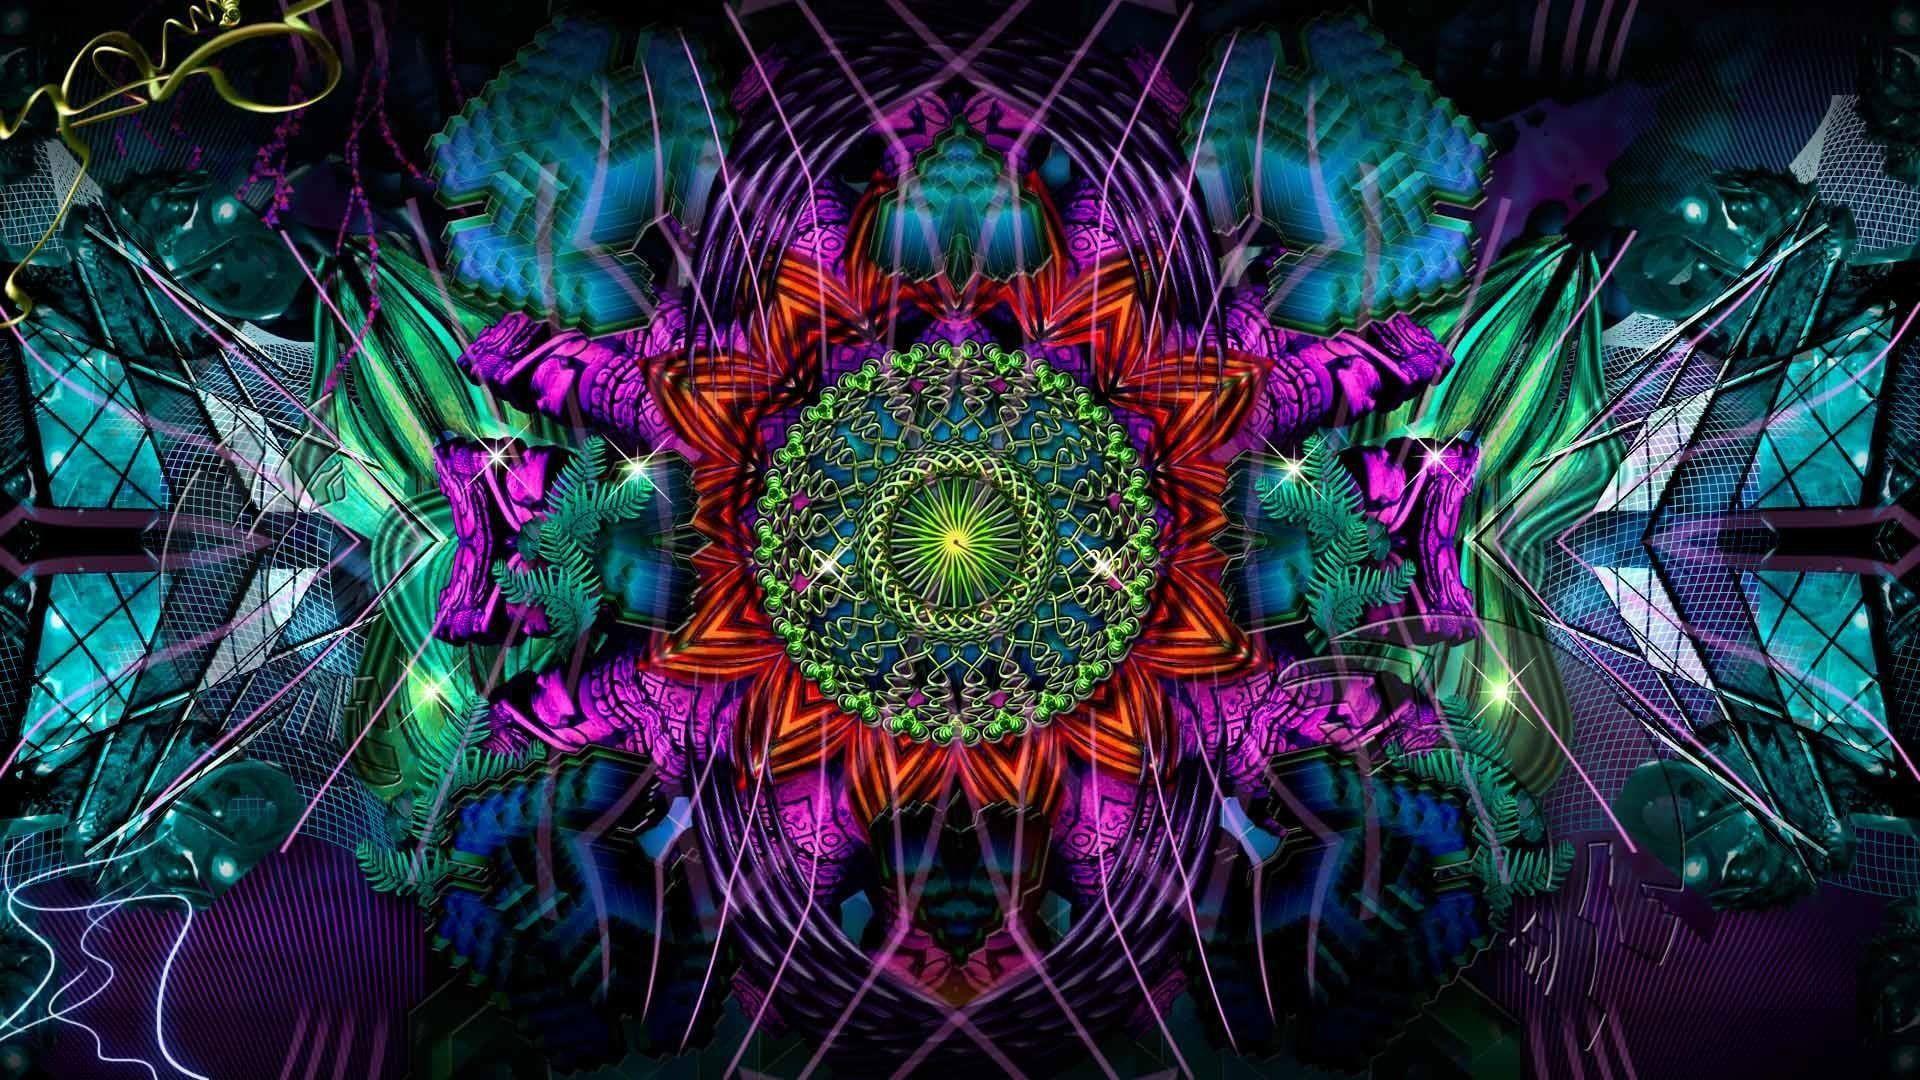 Psychedelic Art Fractal Art Digital Art Kaleidoscope Design Trippy Wallpaper Fractal Art Psychedelic Art